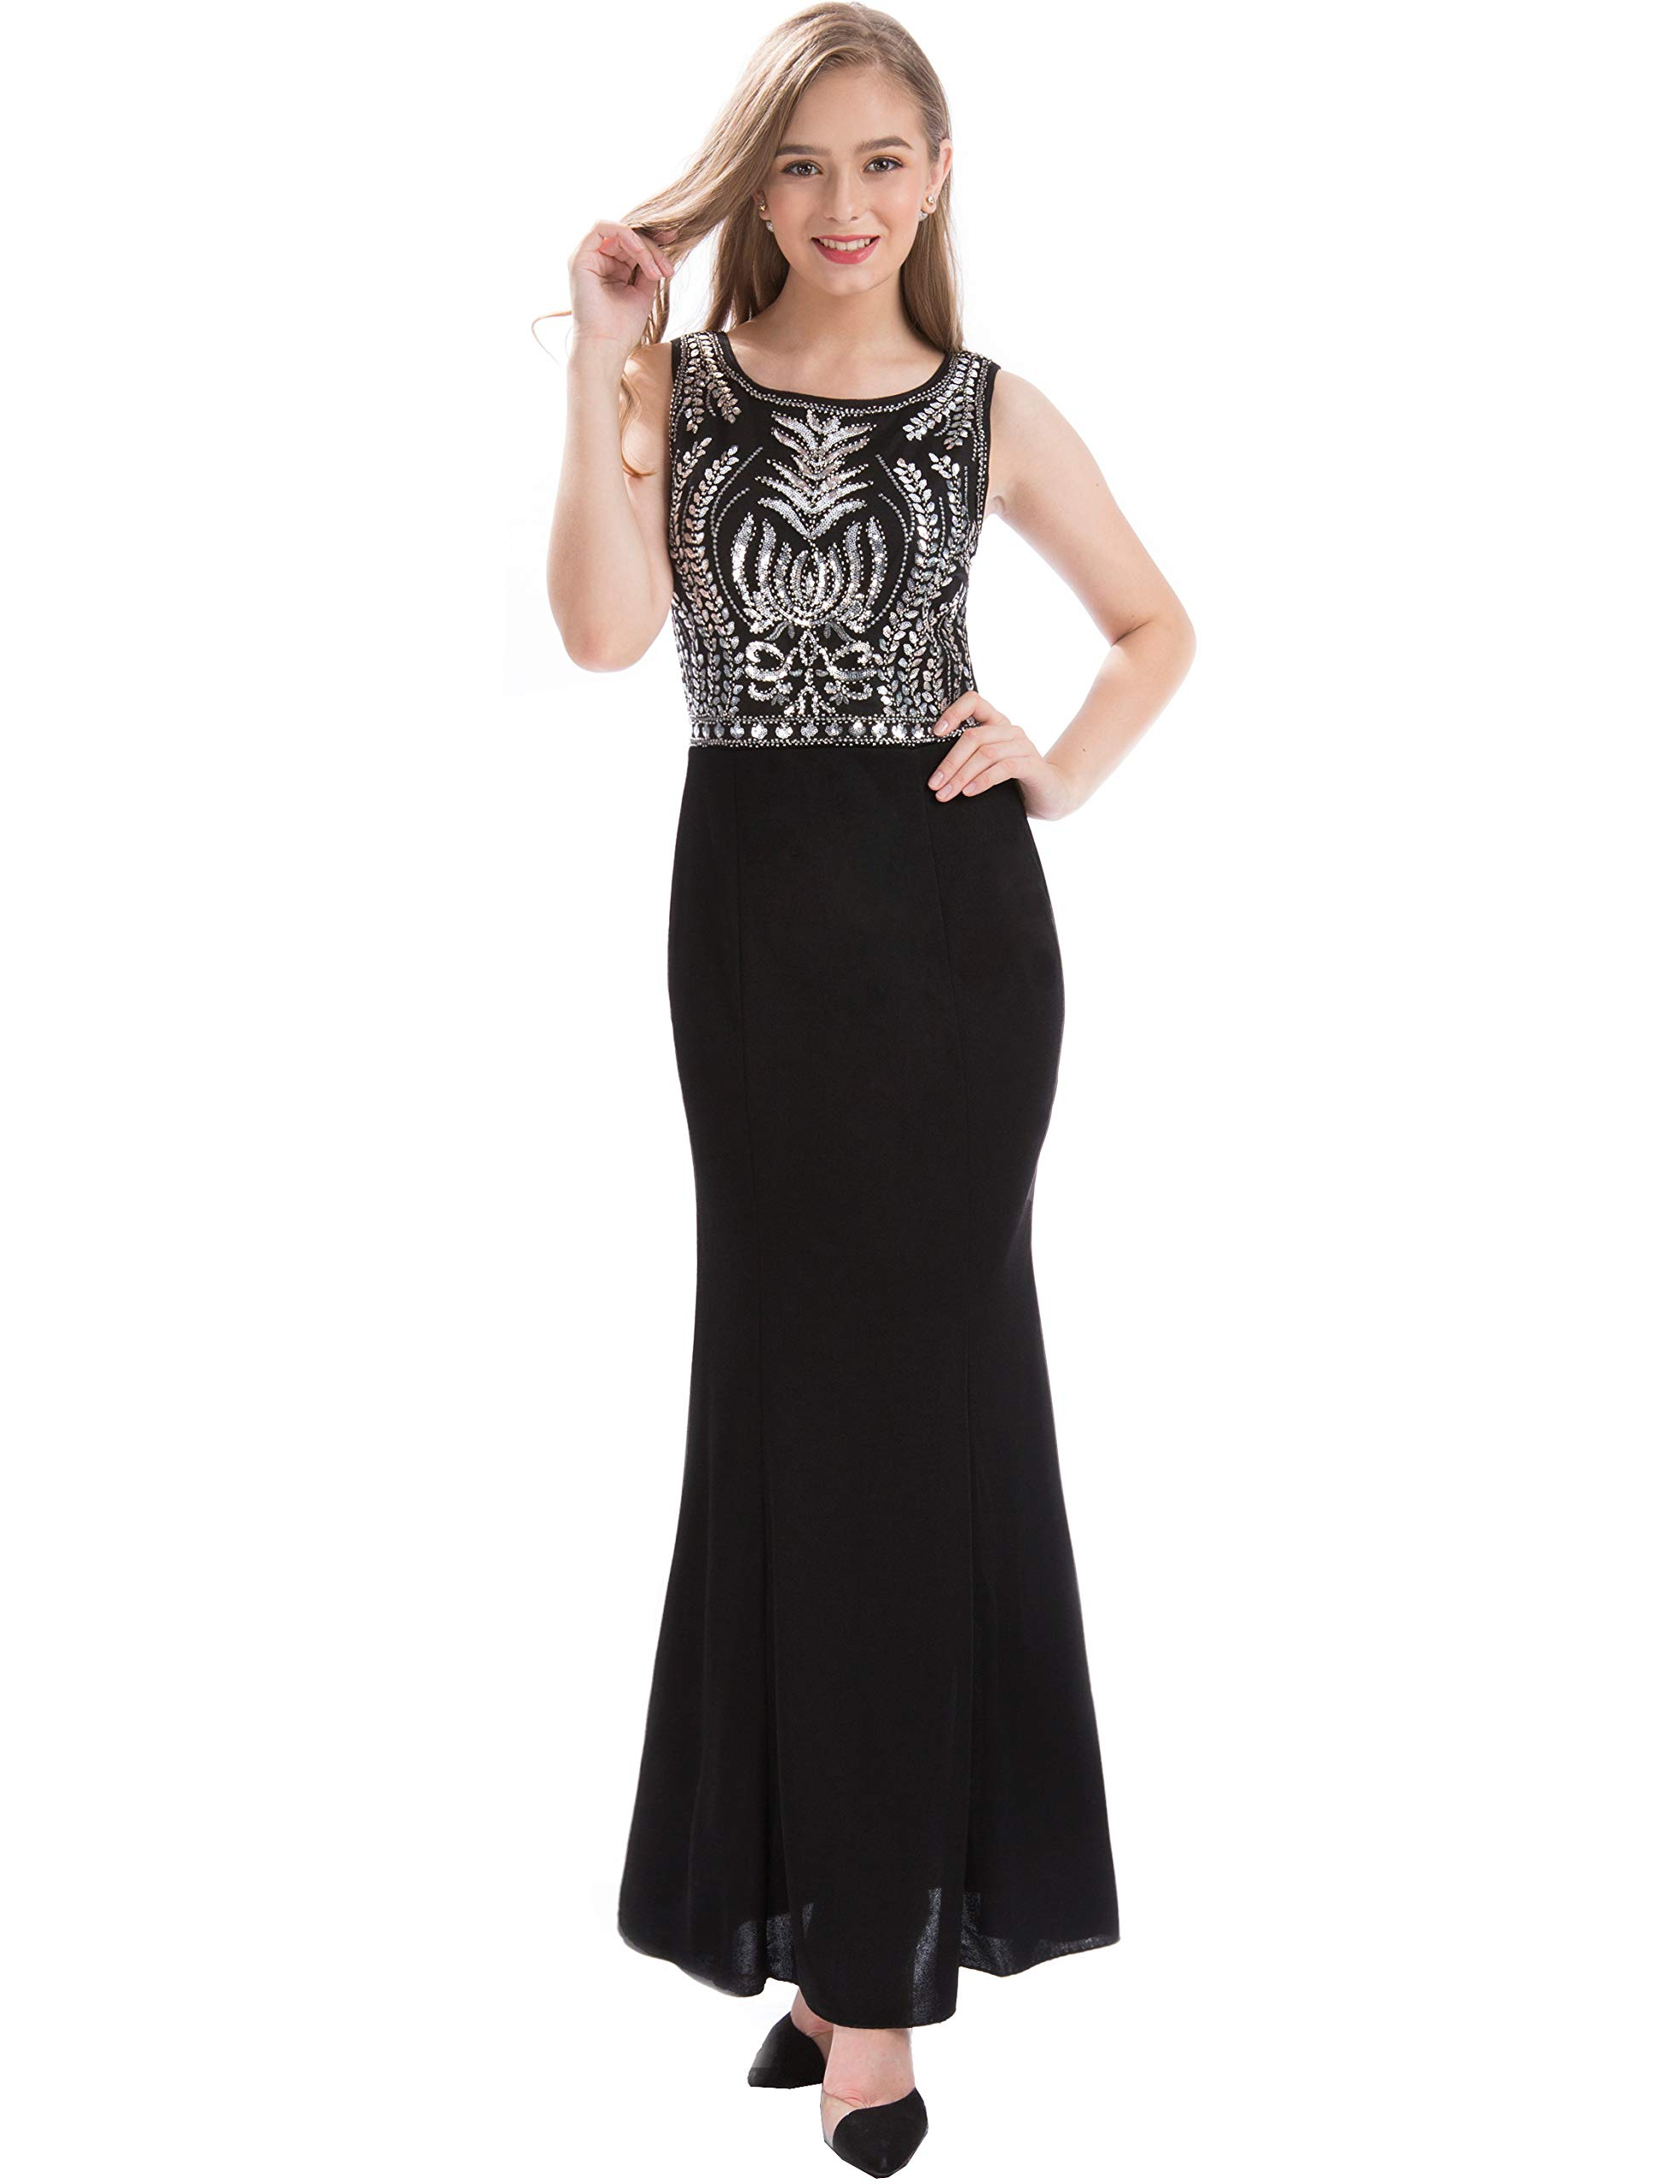 MANER Women's Glitter Glass Beads Sequin Long Formal Gowns Mermaid Evening Prom Dresses (Black/Silver, M)